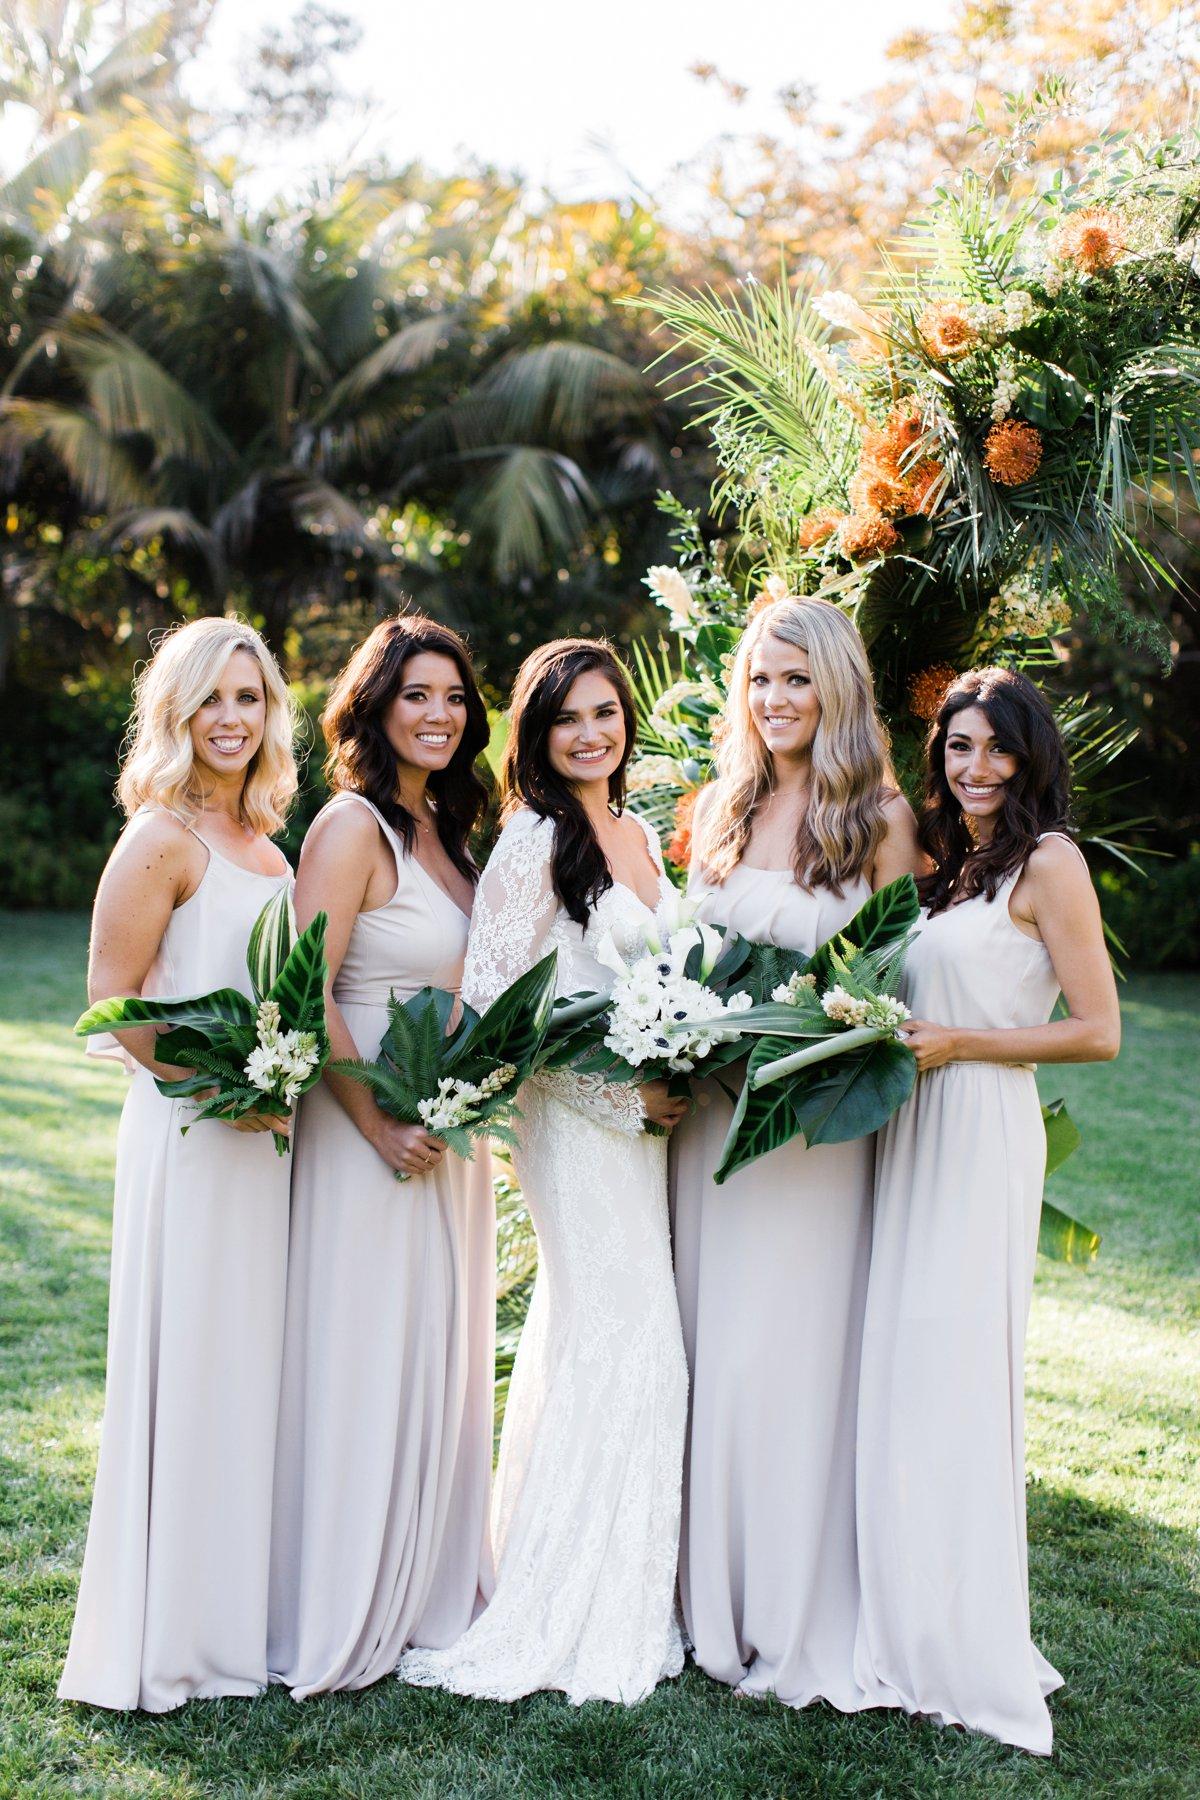 neutral bridesmaid dresses - photo by Anna Delores https://ruffledblog.com/chic-modern-wedding-at-four-seasons-santa-barbara